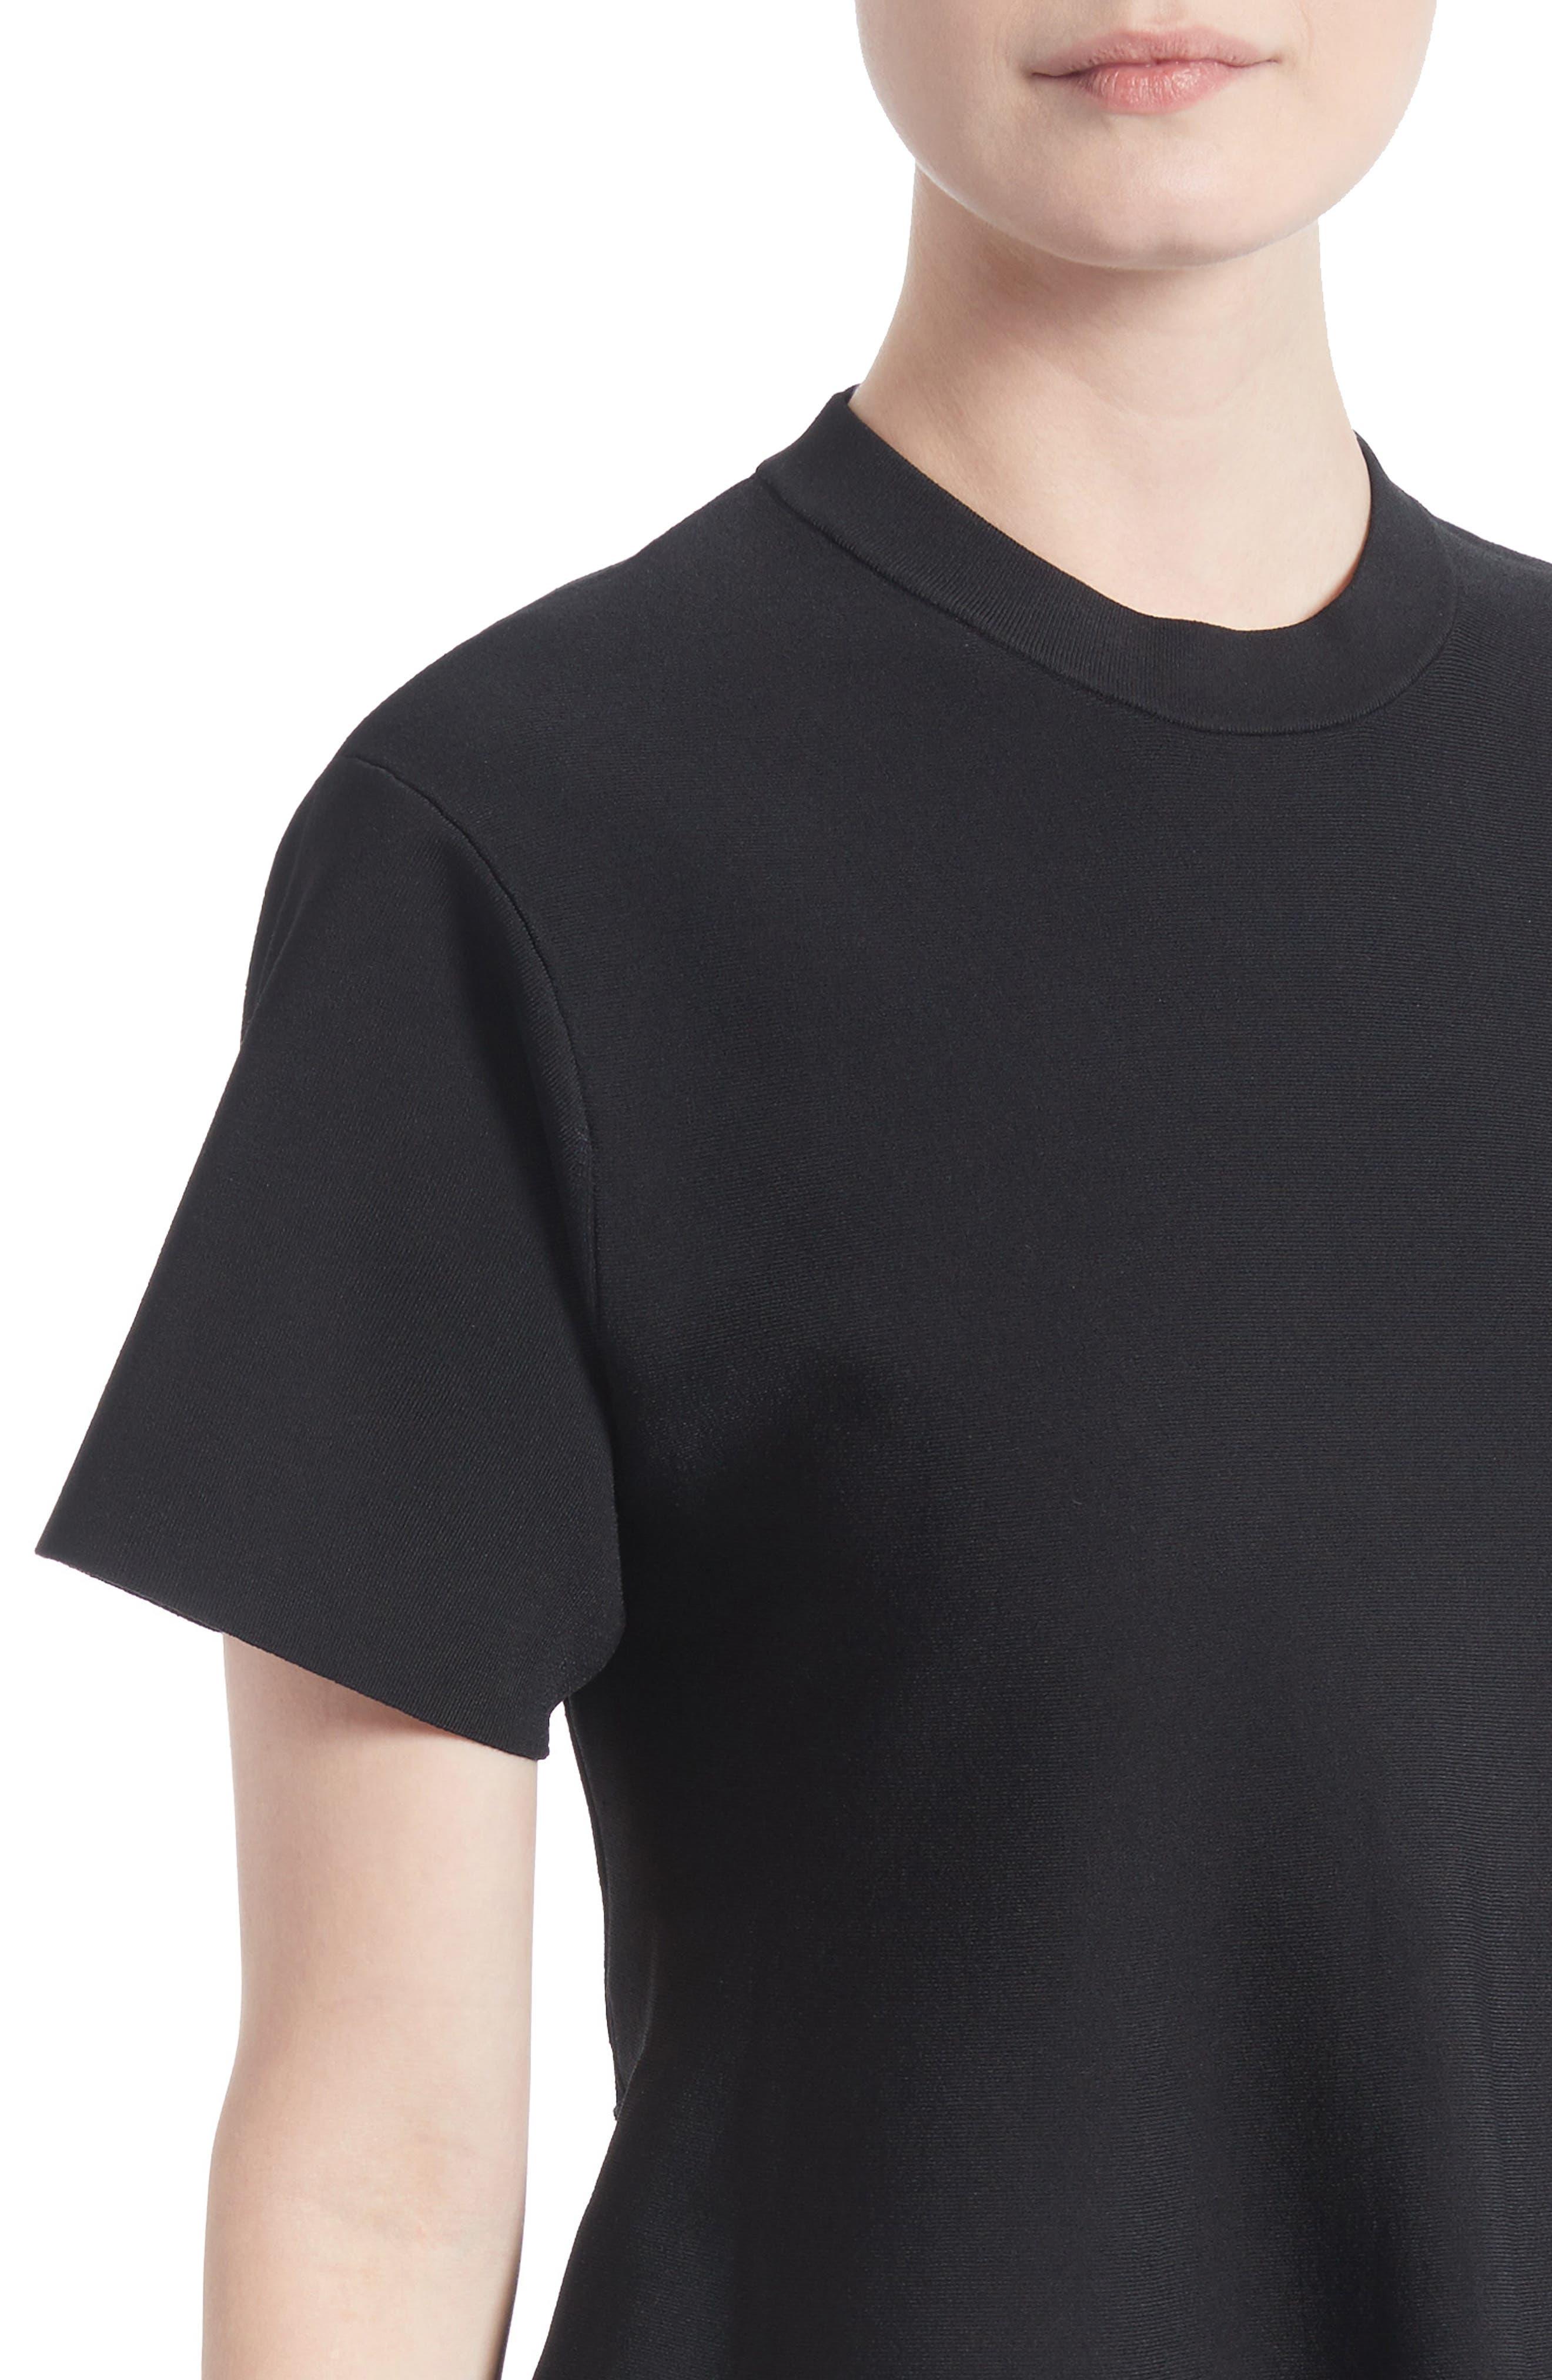 Knit Flare Top,                             Alternate thumbnail 4, color,                             Black